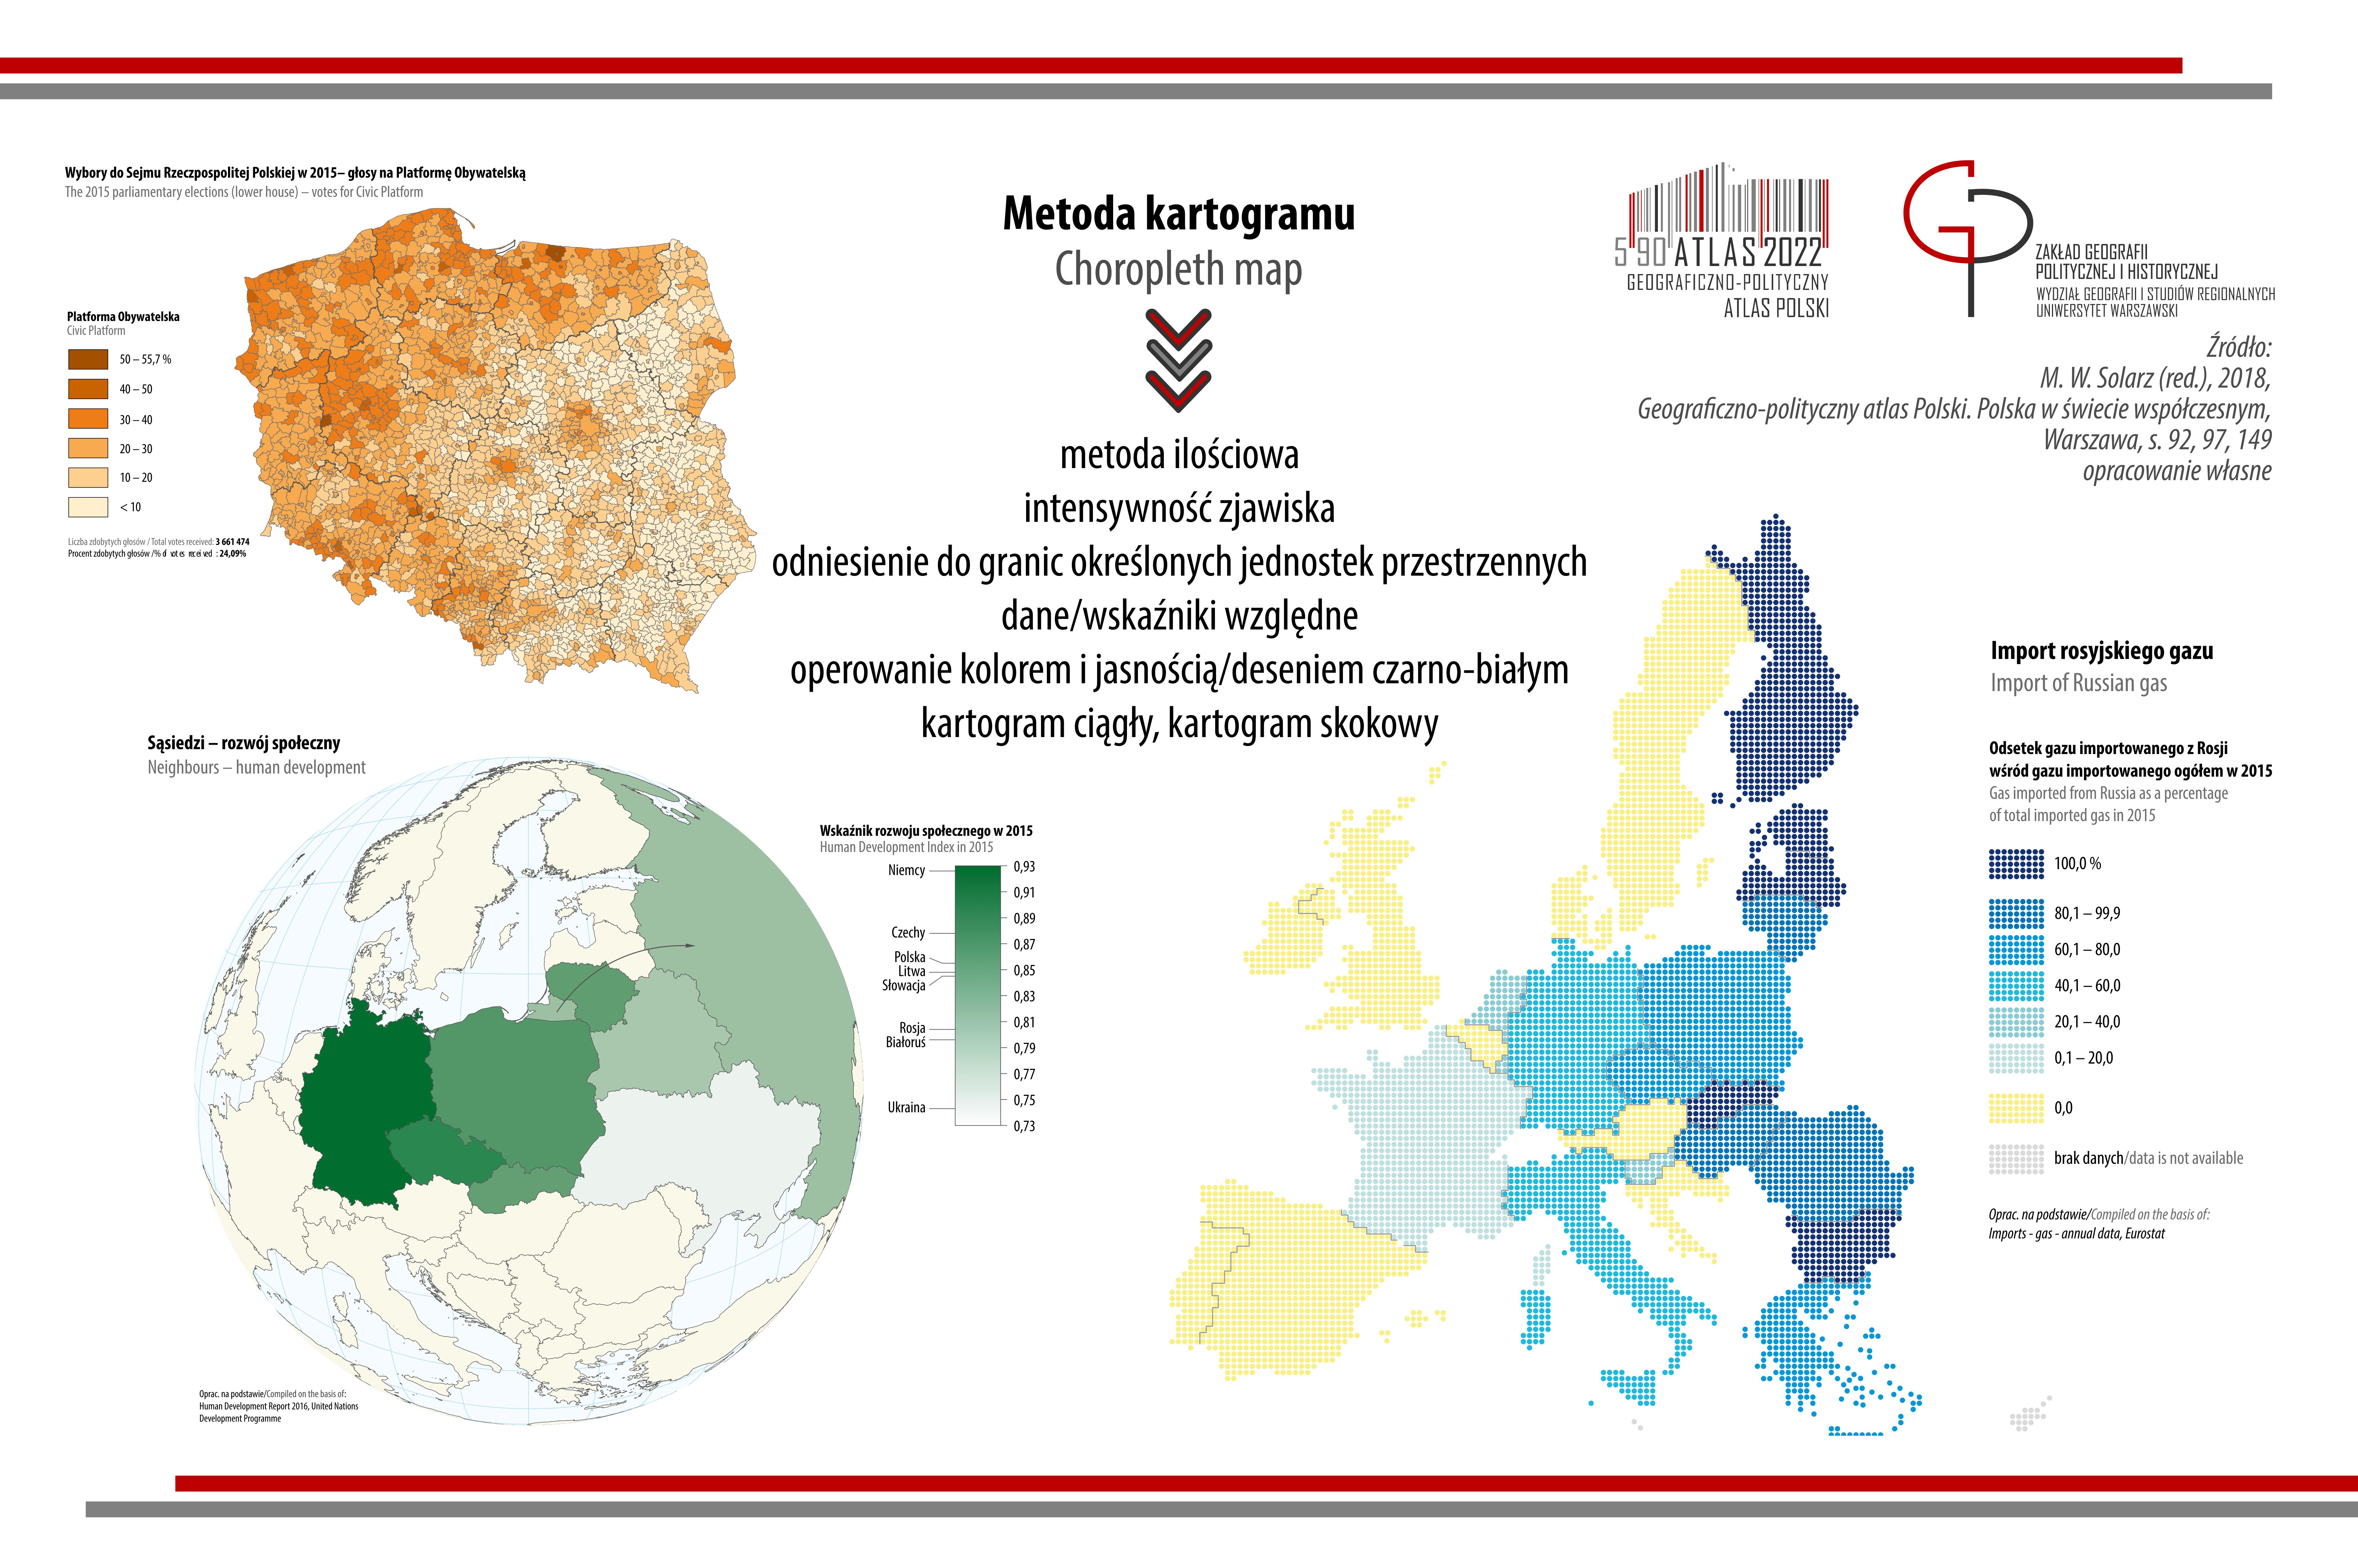 metoda kartogramu